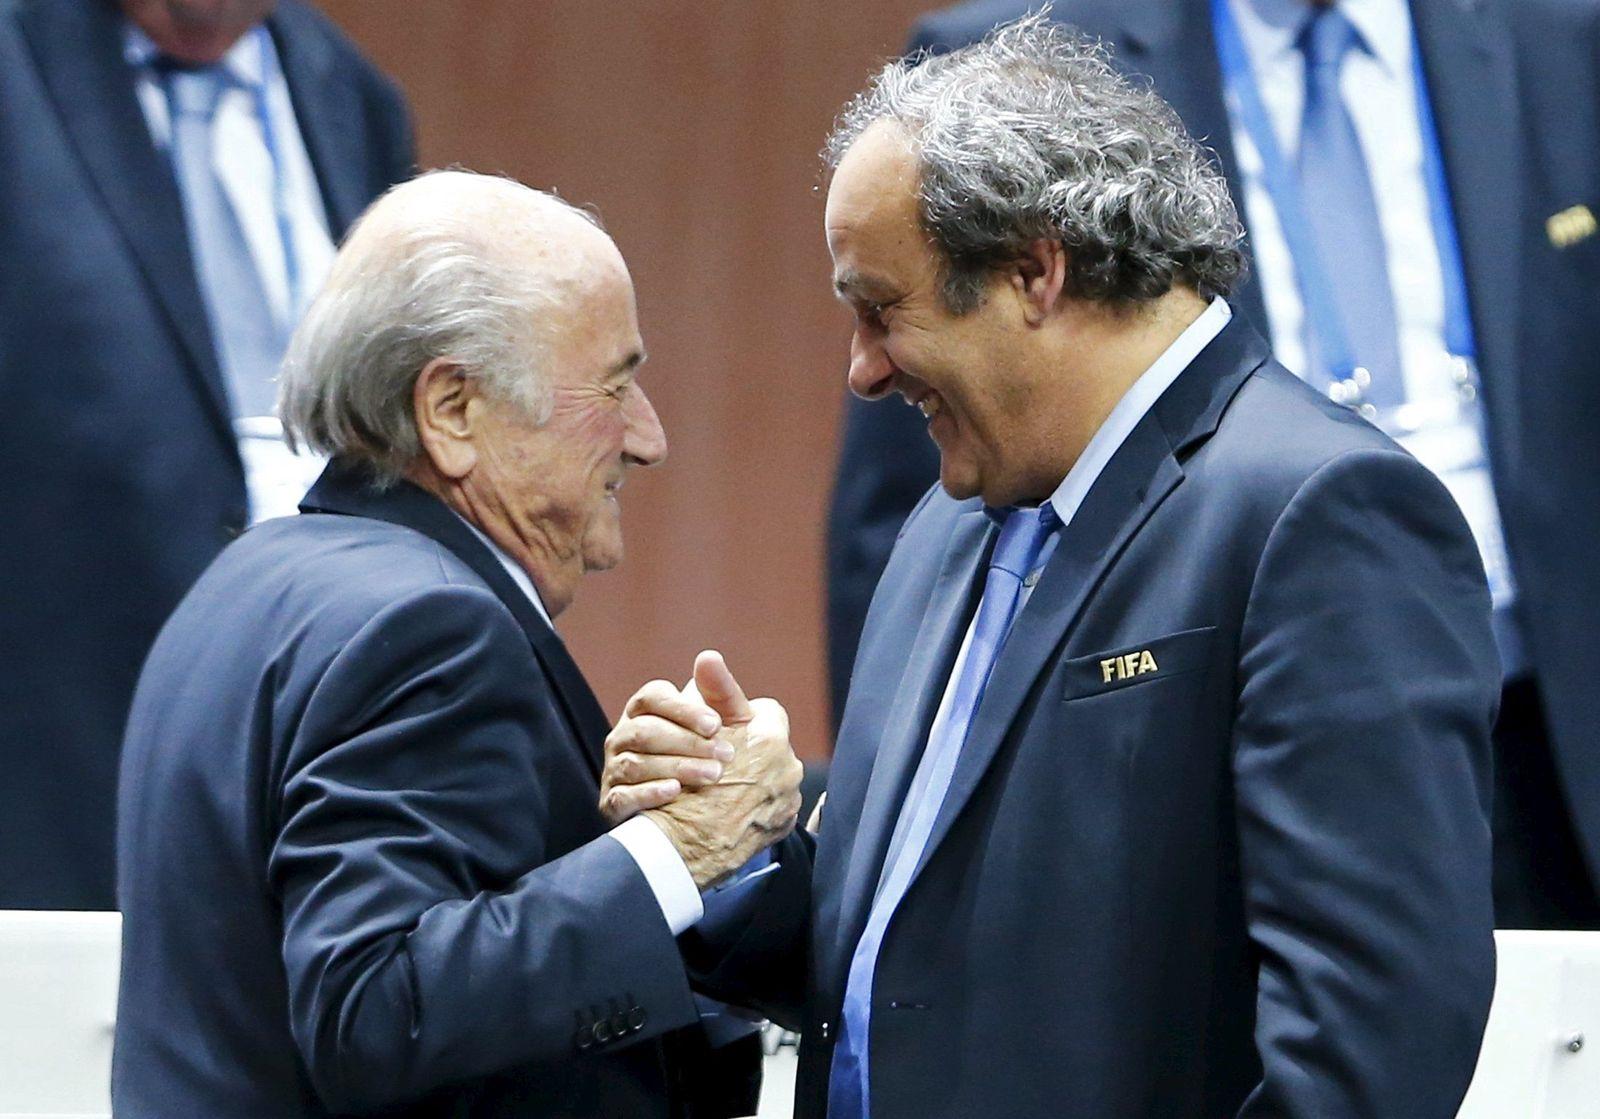 SOCCER-FIFA/ETHICS